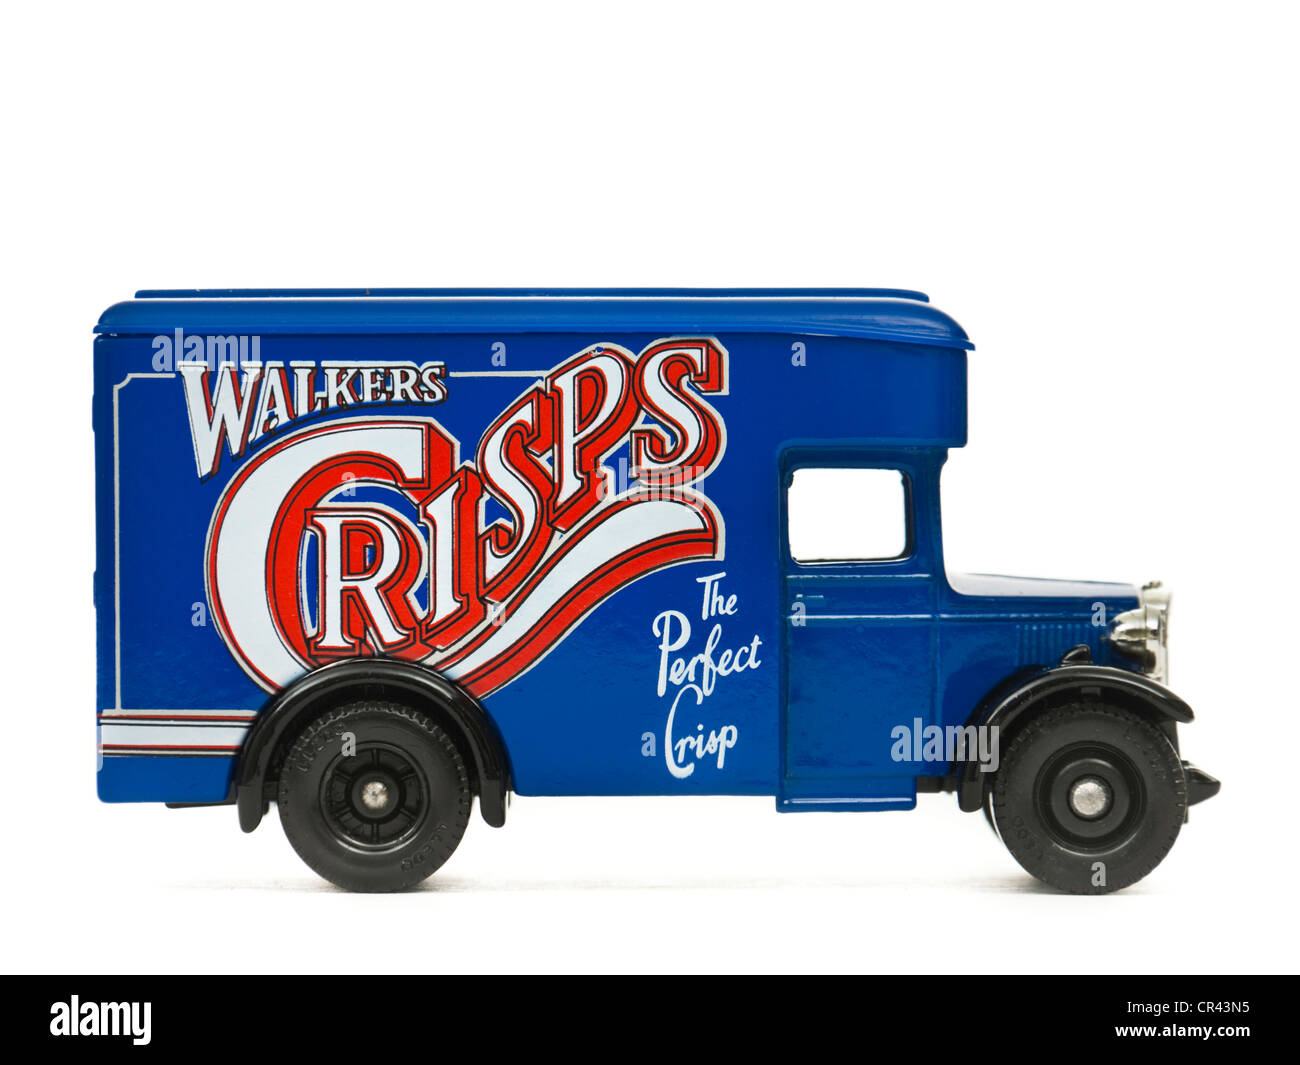 Walkers Crisps model delivery van by Lledo (part of Walkers Crisps promotional offer) - Stock Image